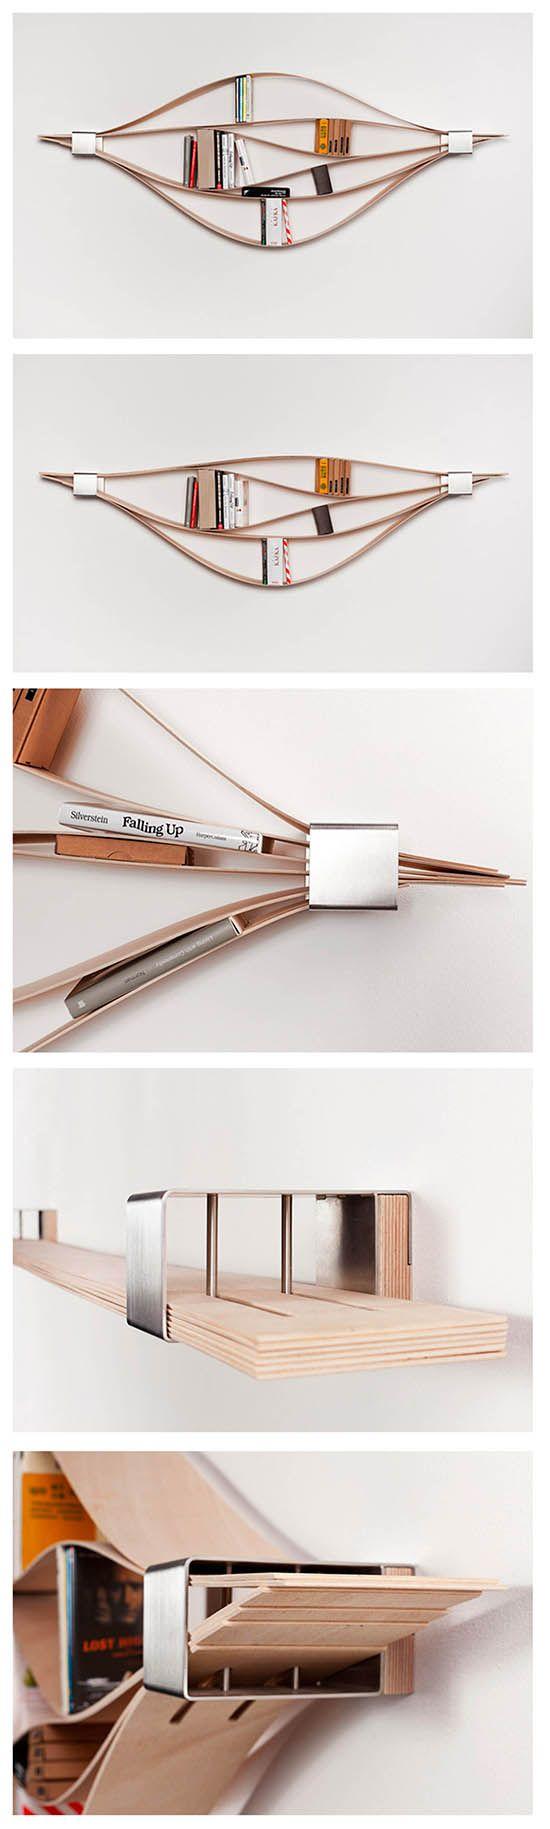 flexible bookrack